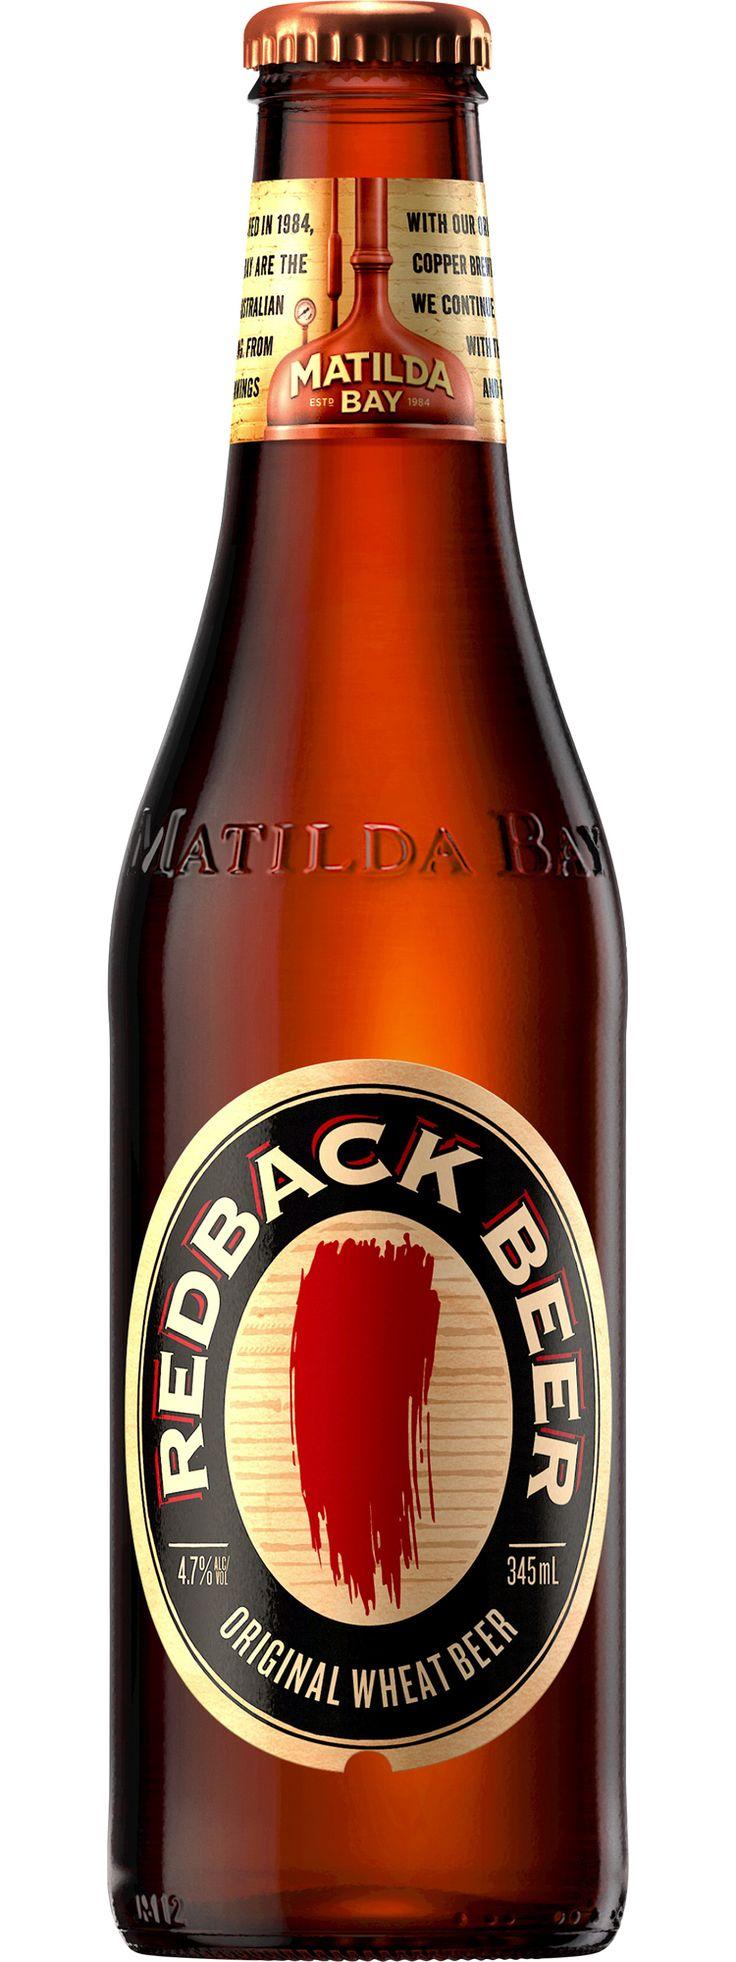 Matilda Bay; Redback beer.